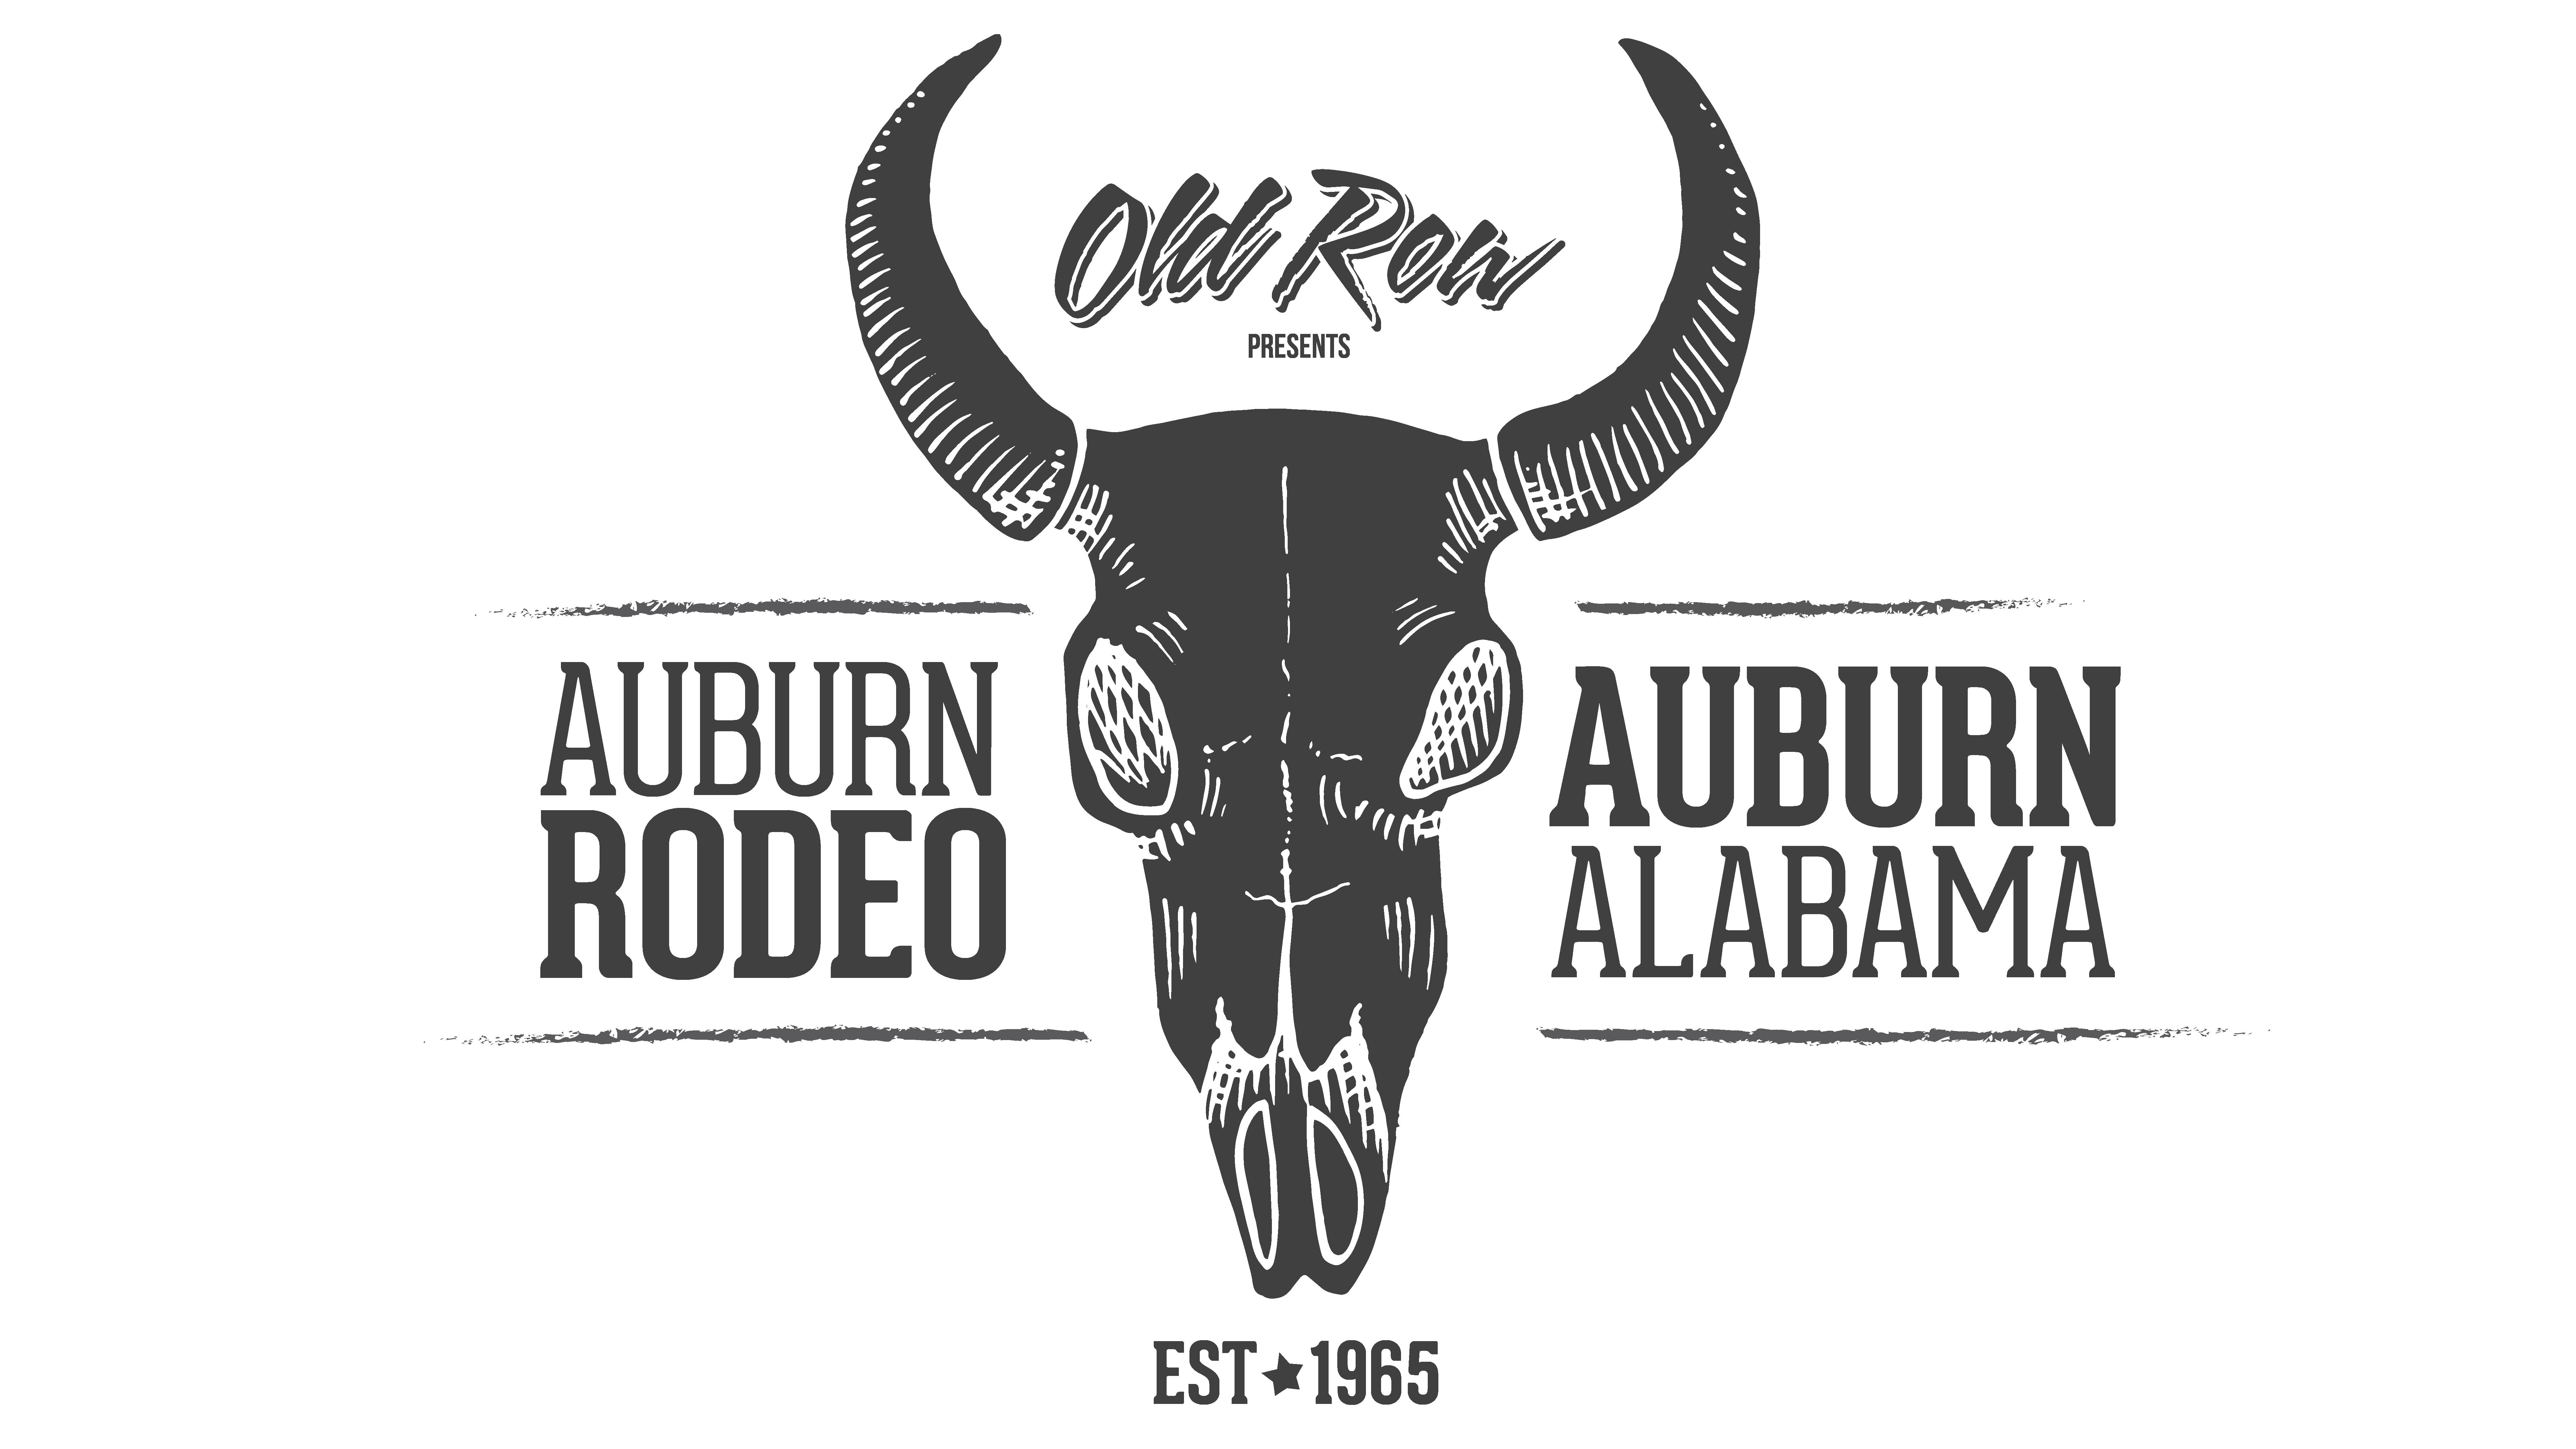 Auburn-rodeo-logo.png